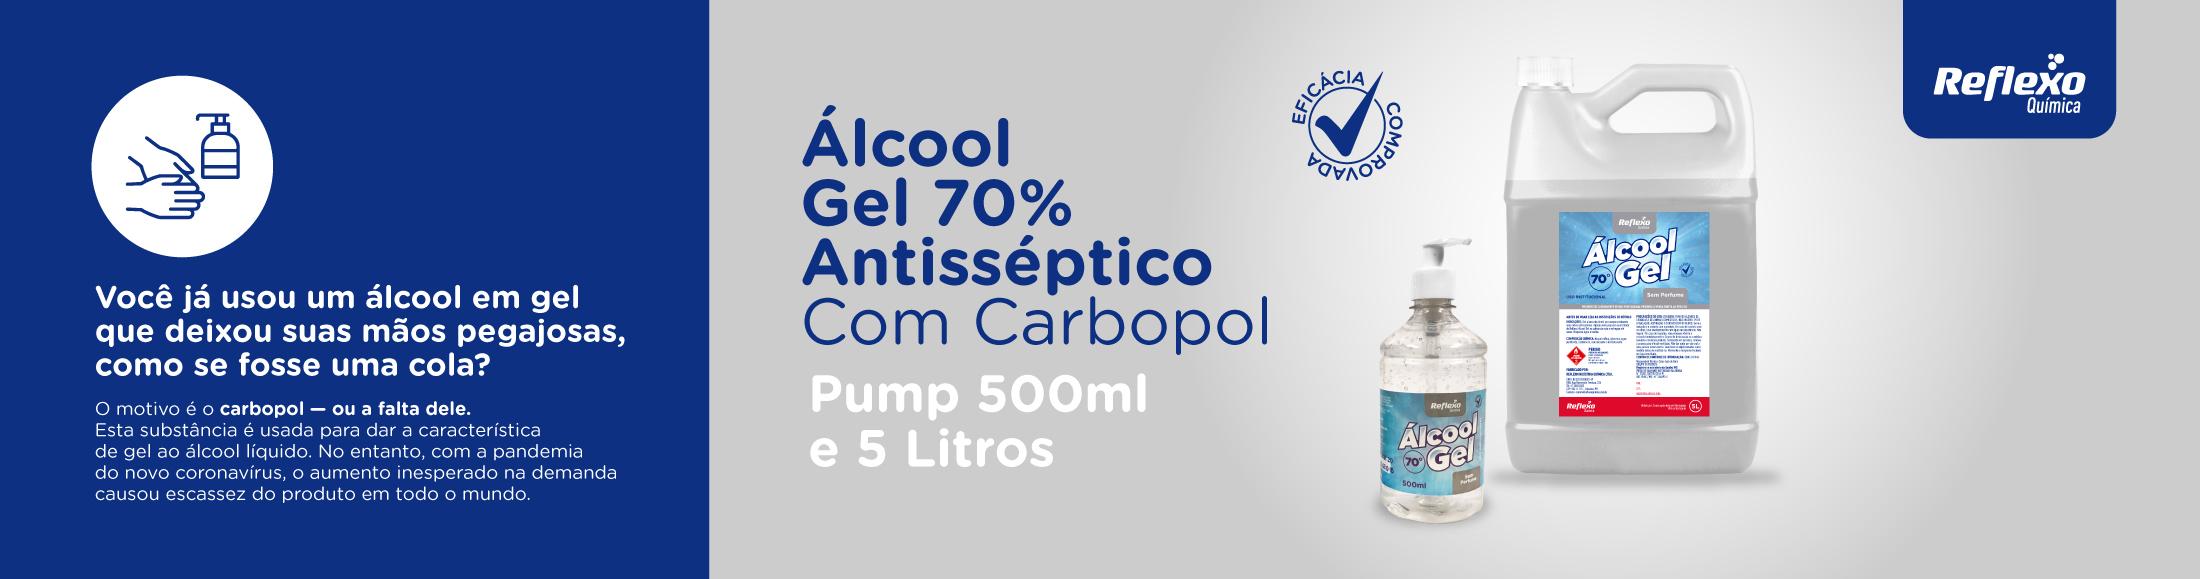 Alcool Gel 70